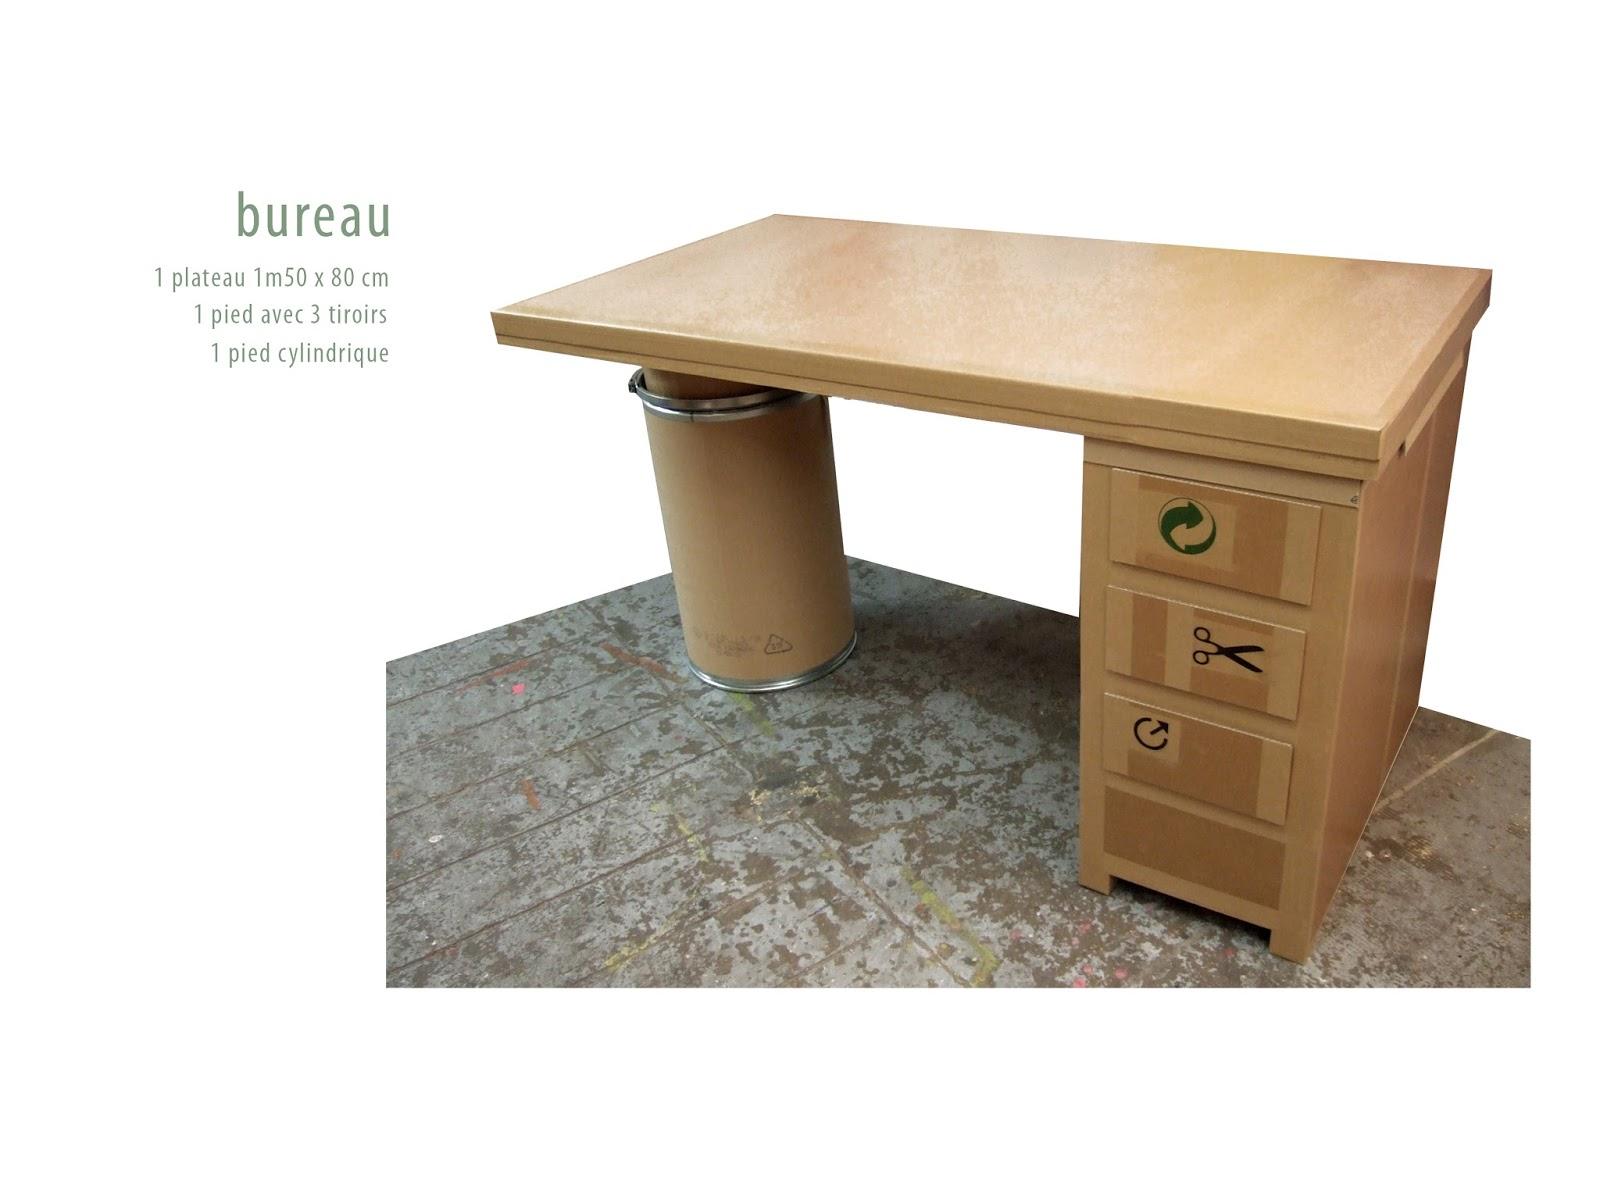 juliadesign meuble en carton bureaux. Black Bedroom Furniture Sets. Home Design Ideas